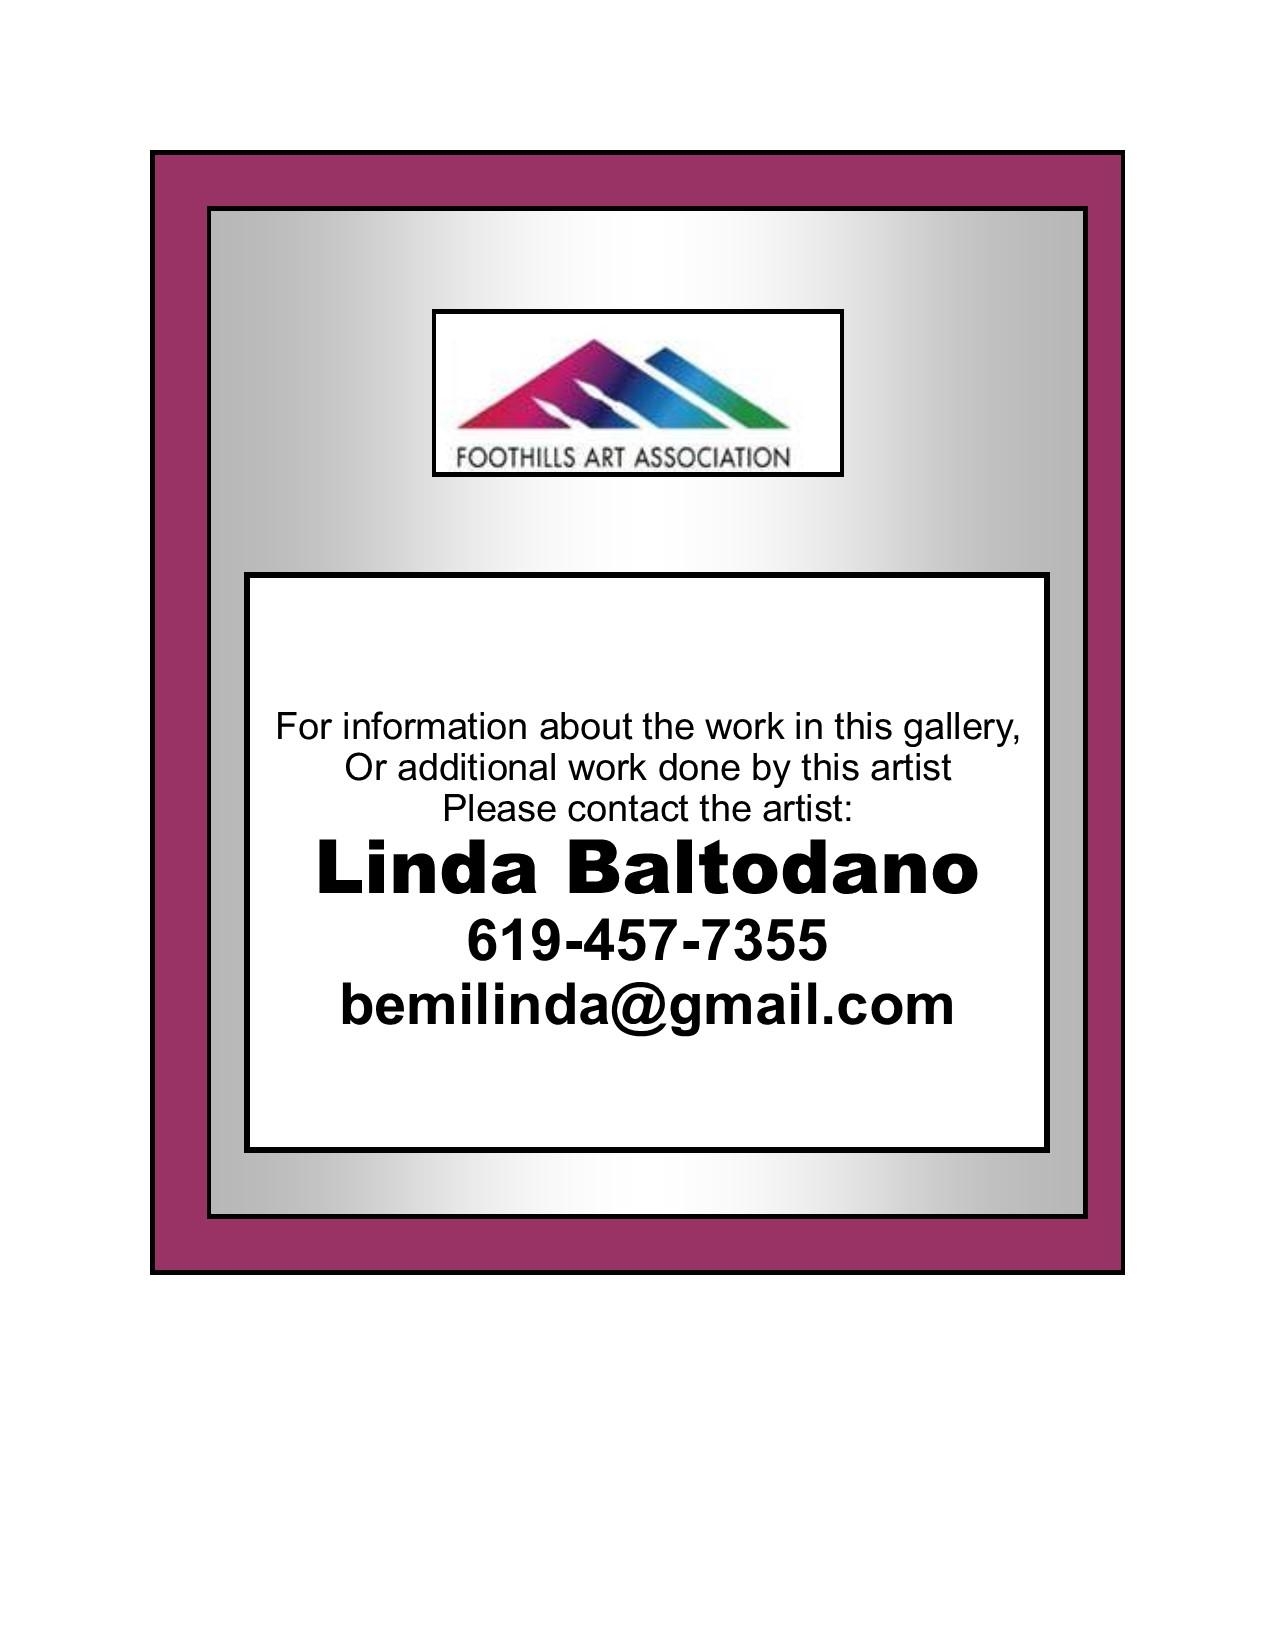 Linda Baltodano - Contacts